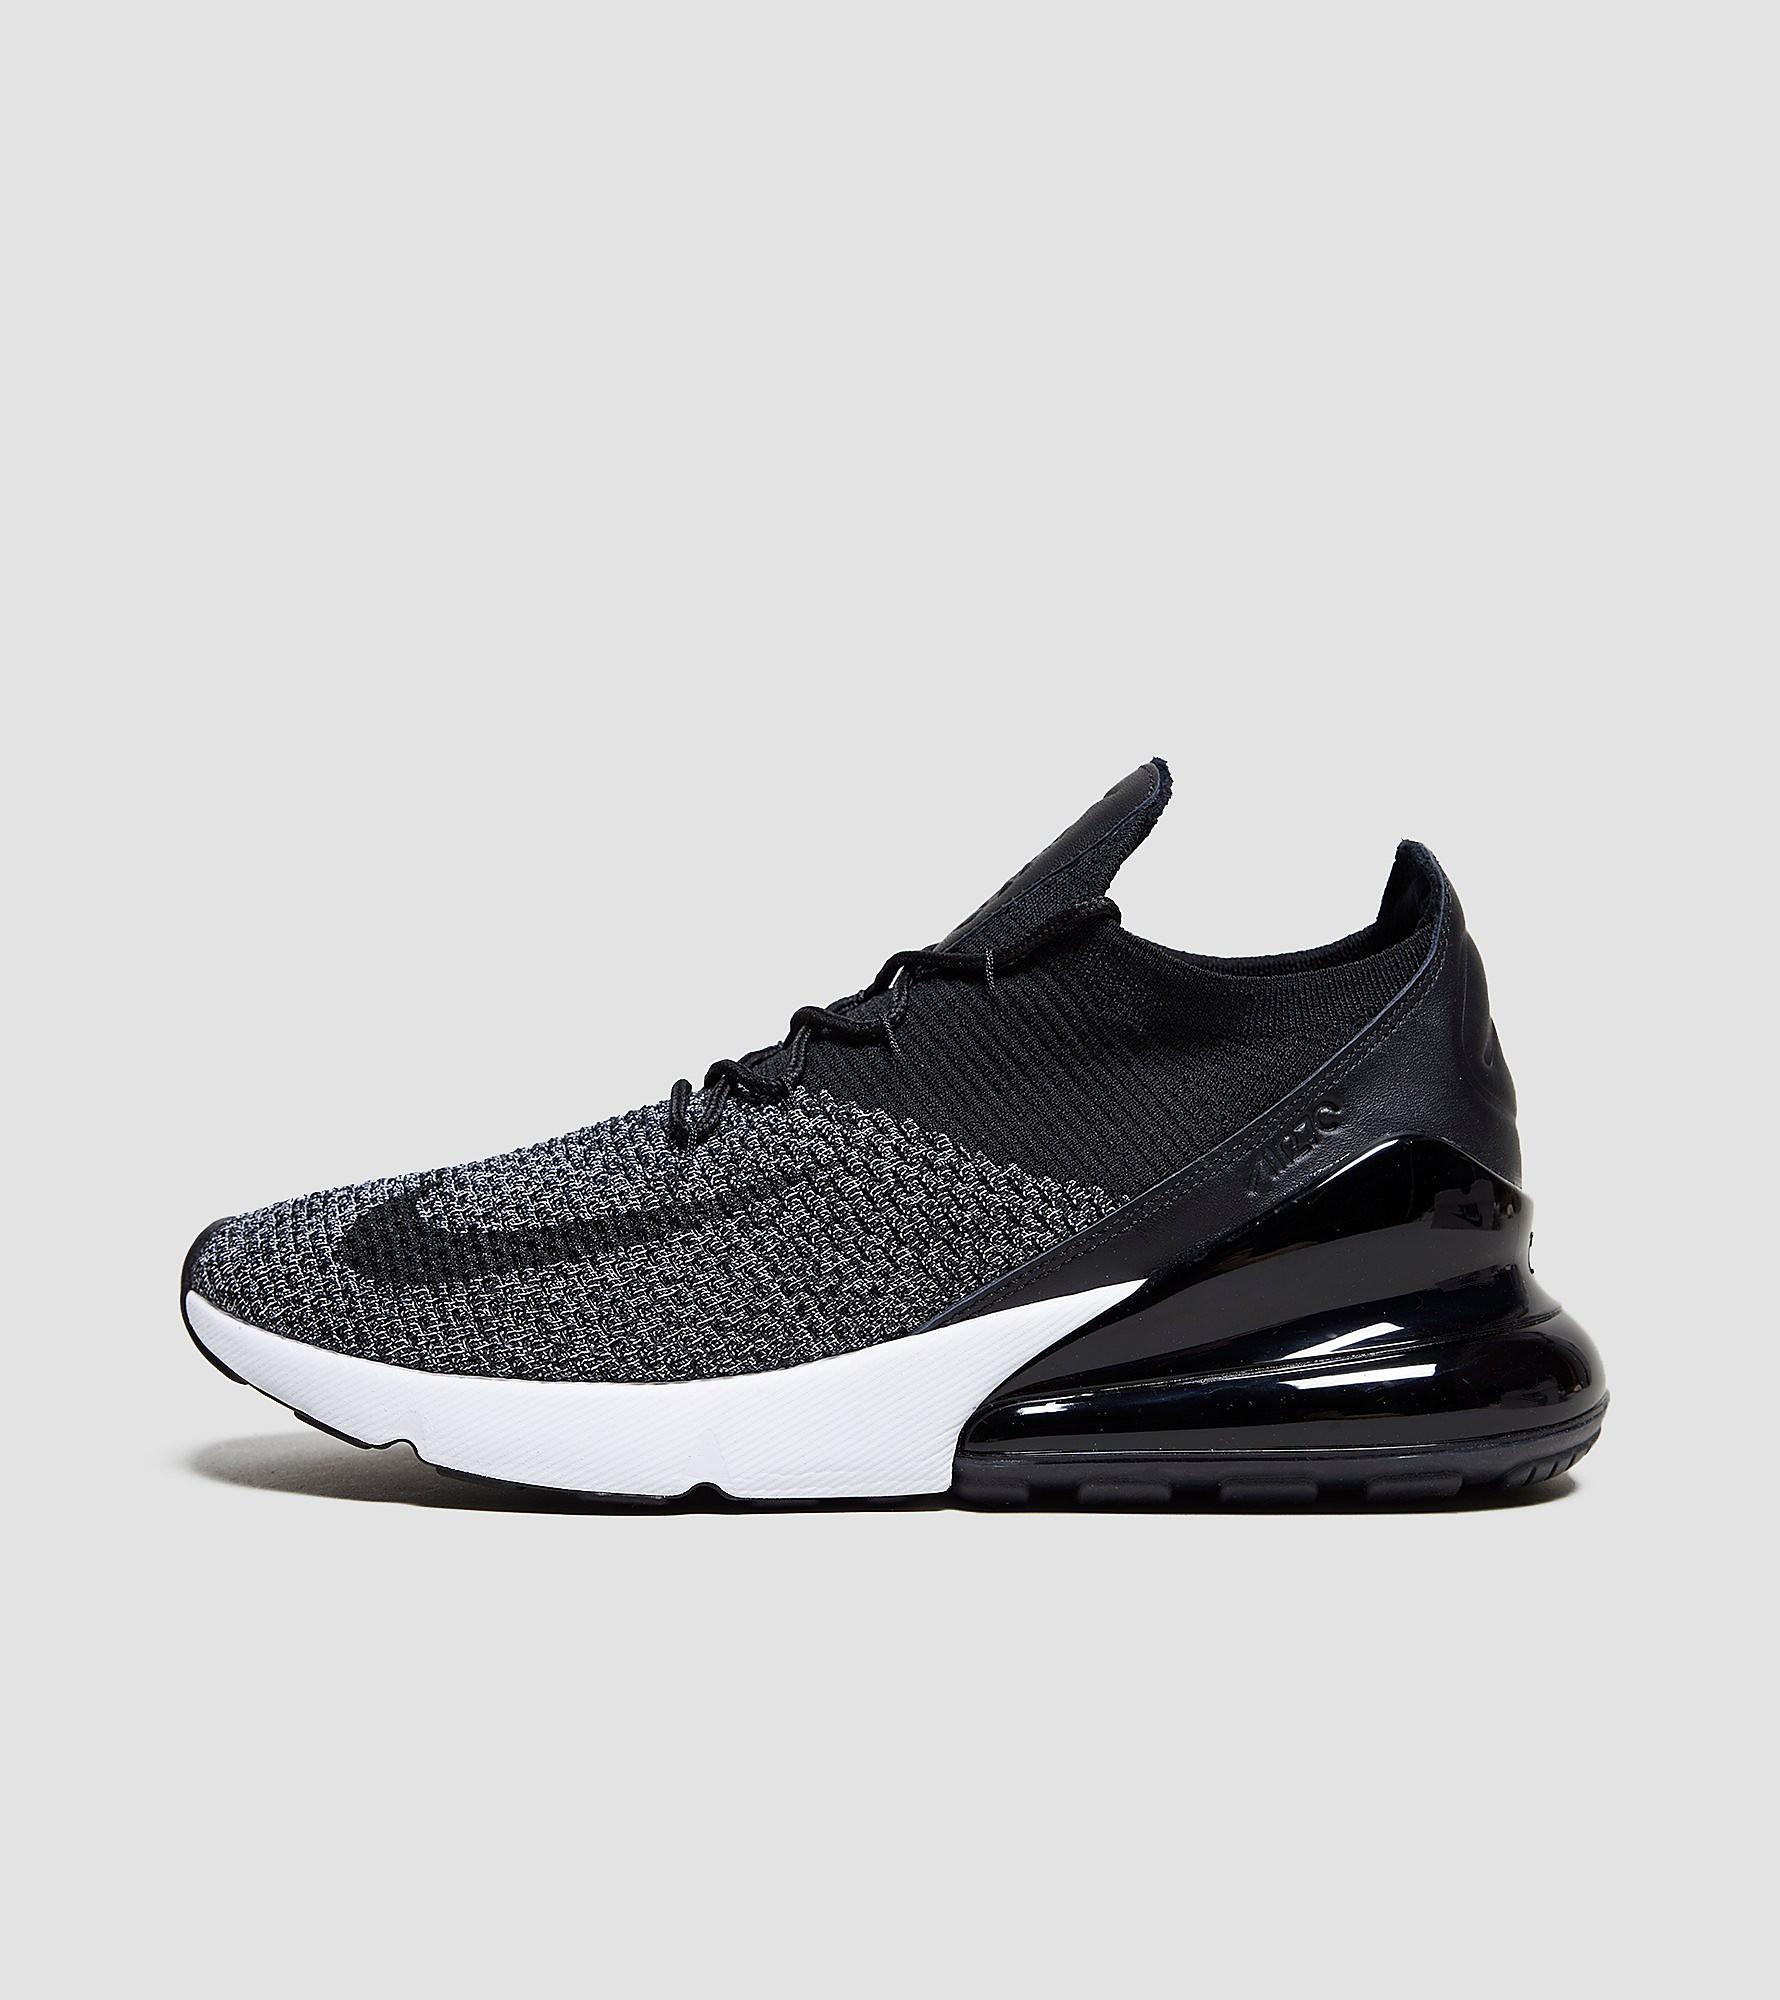 size 40 5f586 5fae9 Nike Air Max 270 Flyknit (zwart)